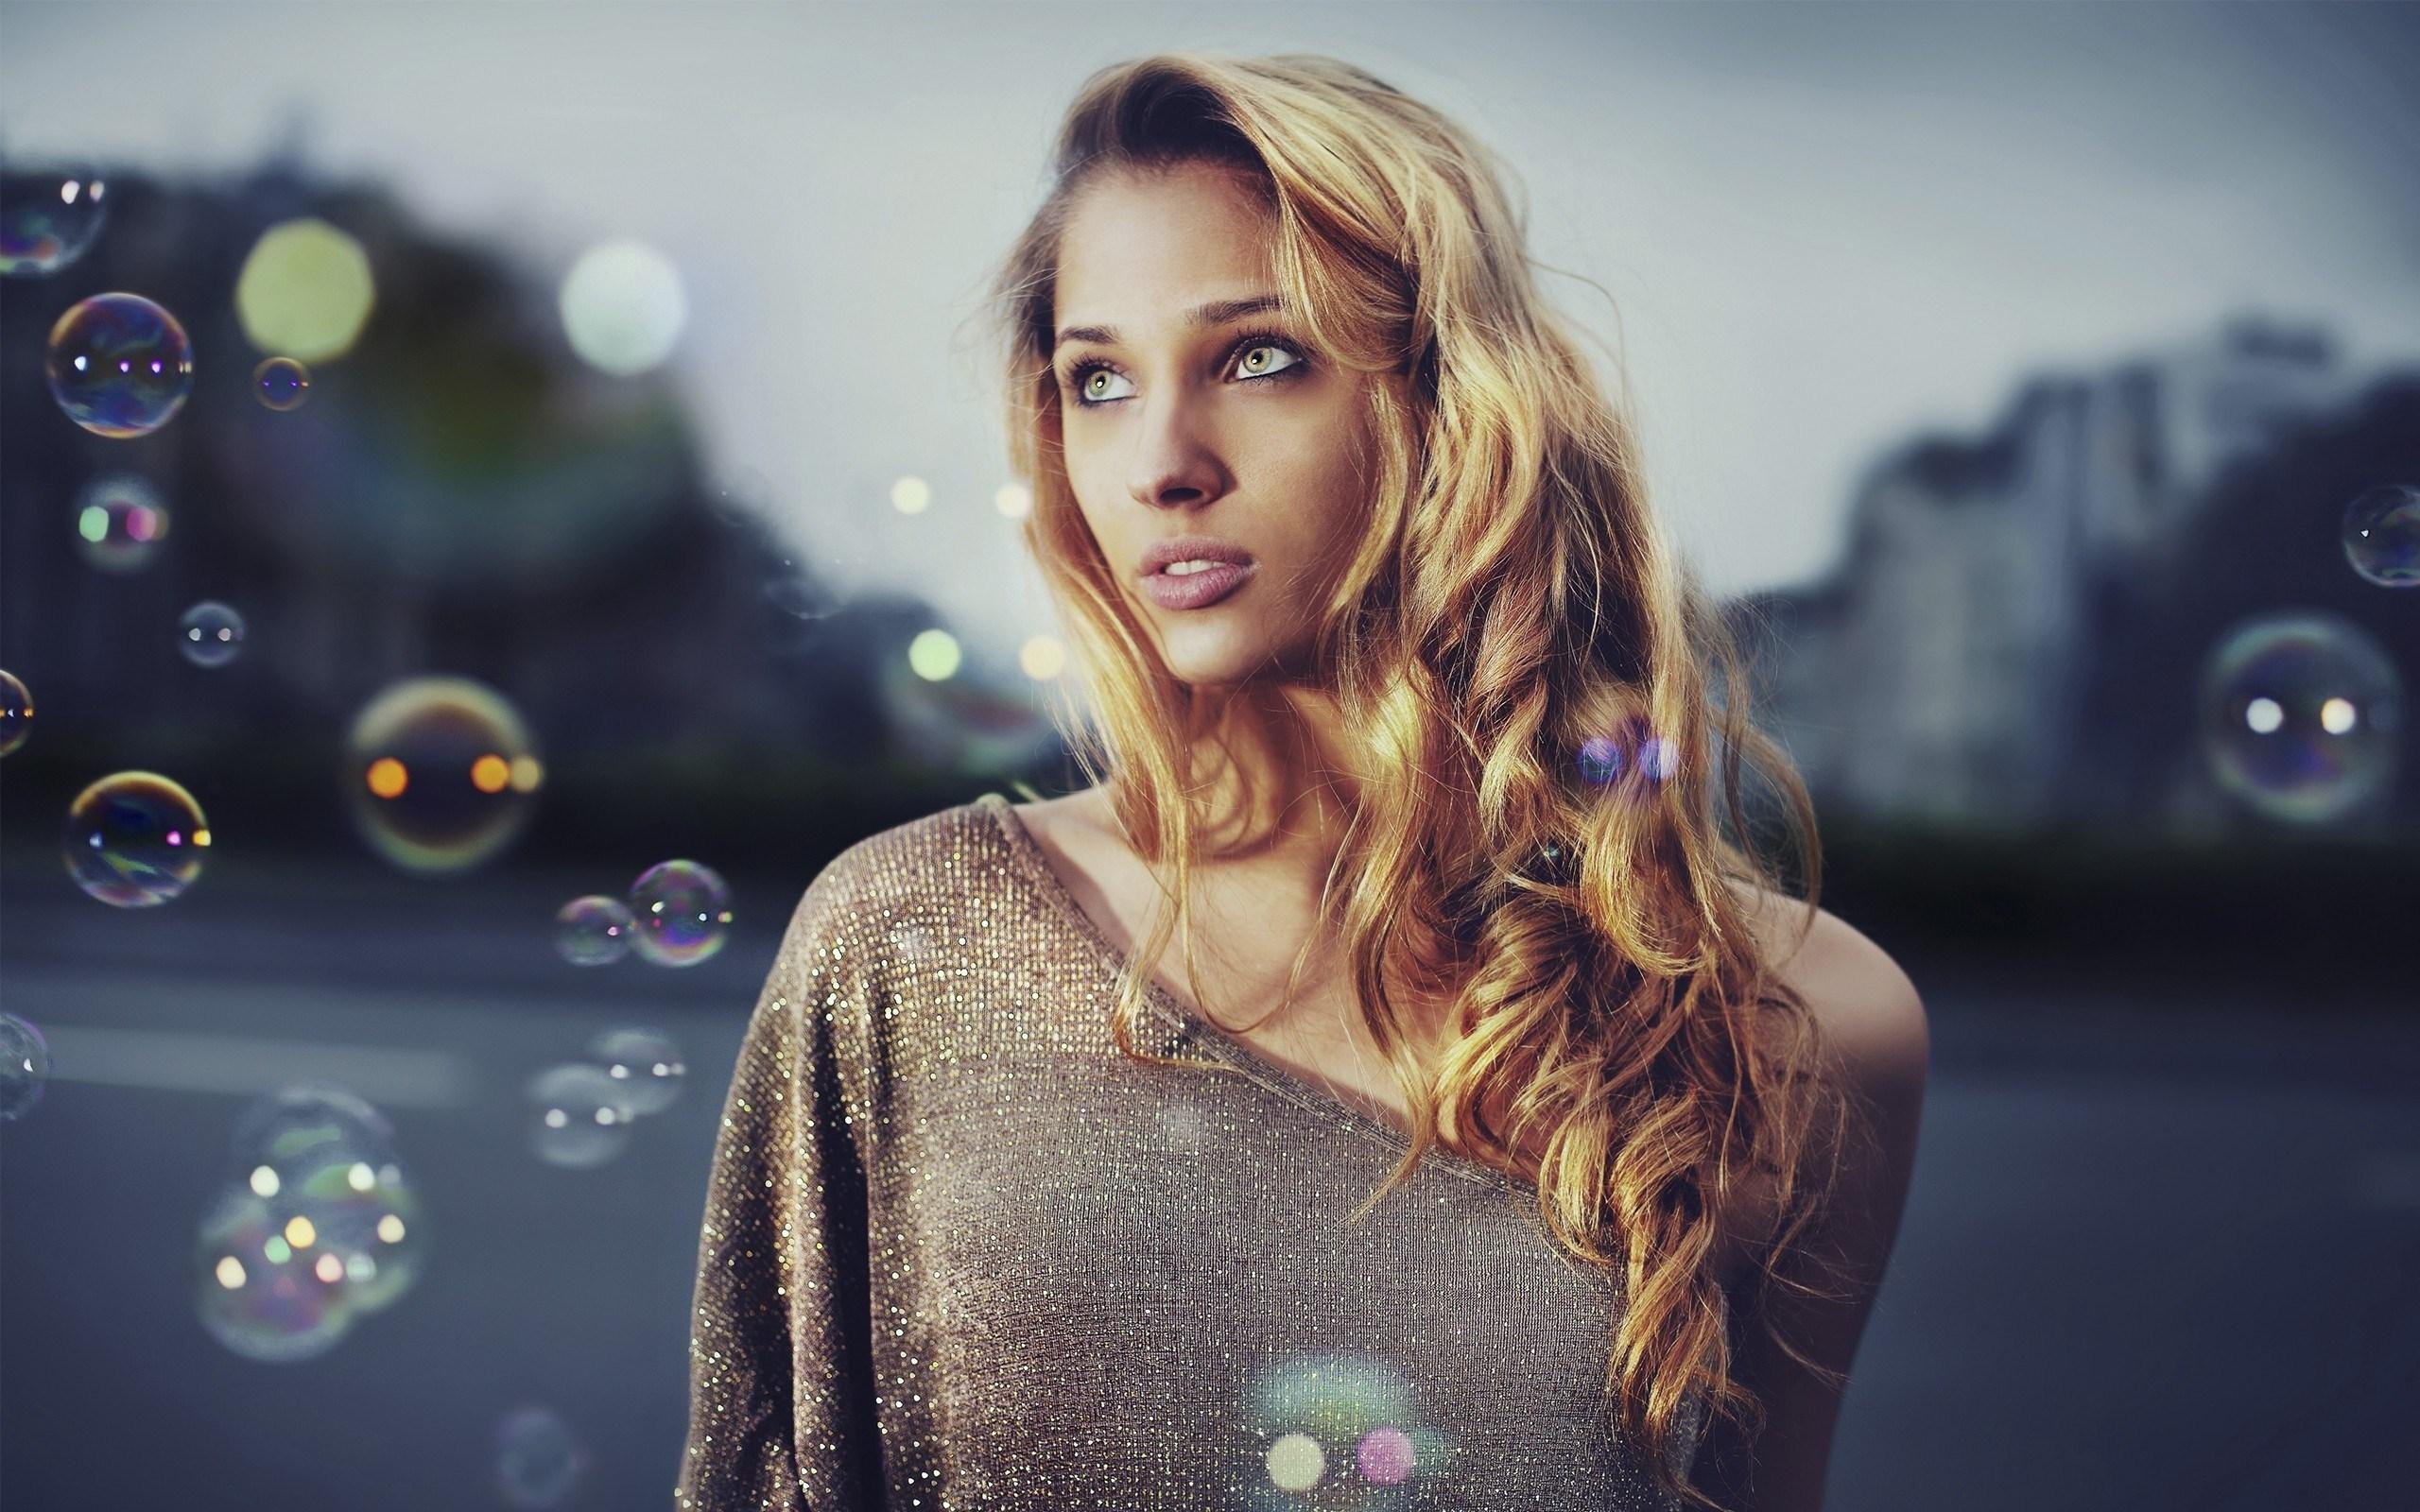 Girl Blonde Bubbles